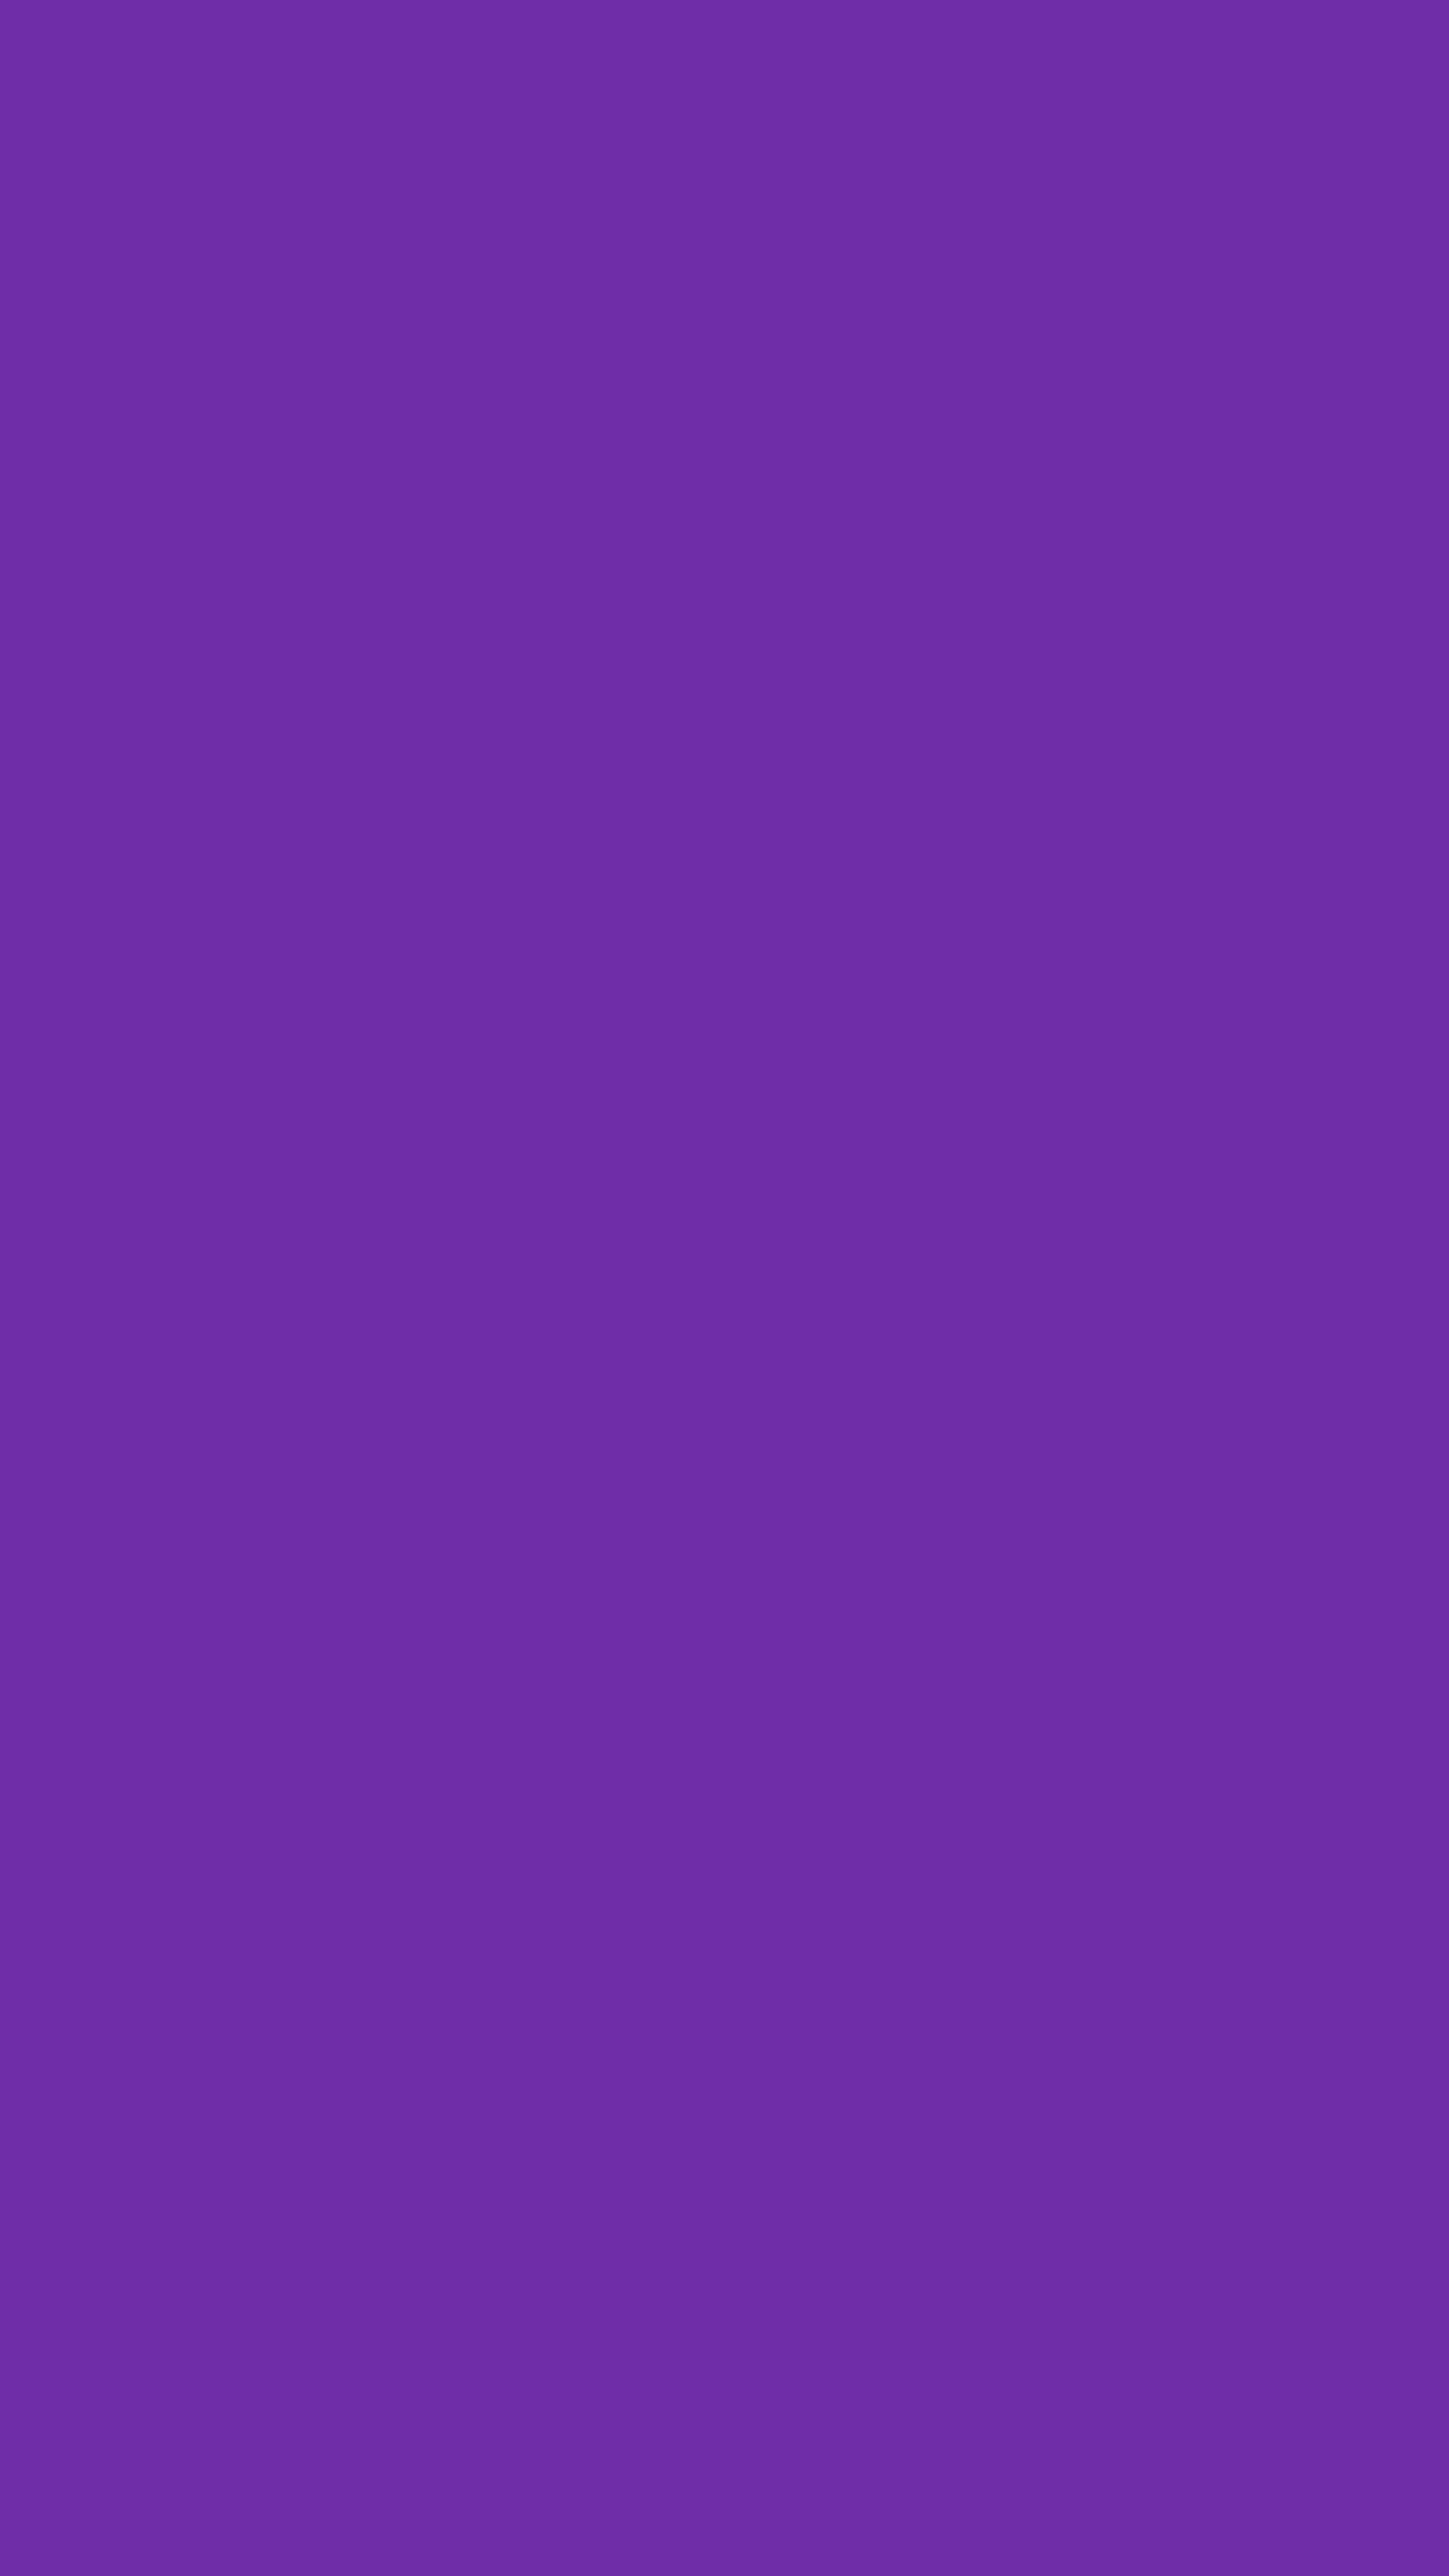 Grape Solid Color Background Wallpaper